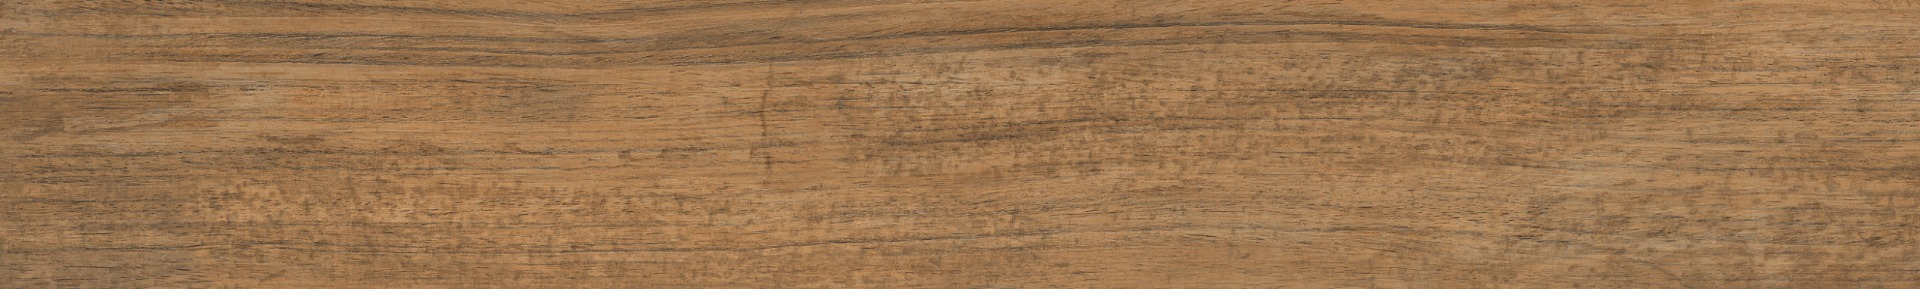 DGVT Chestnut Oak Wood